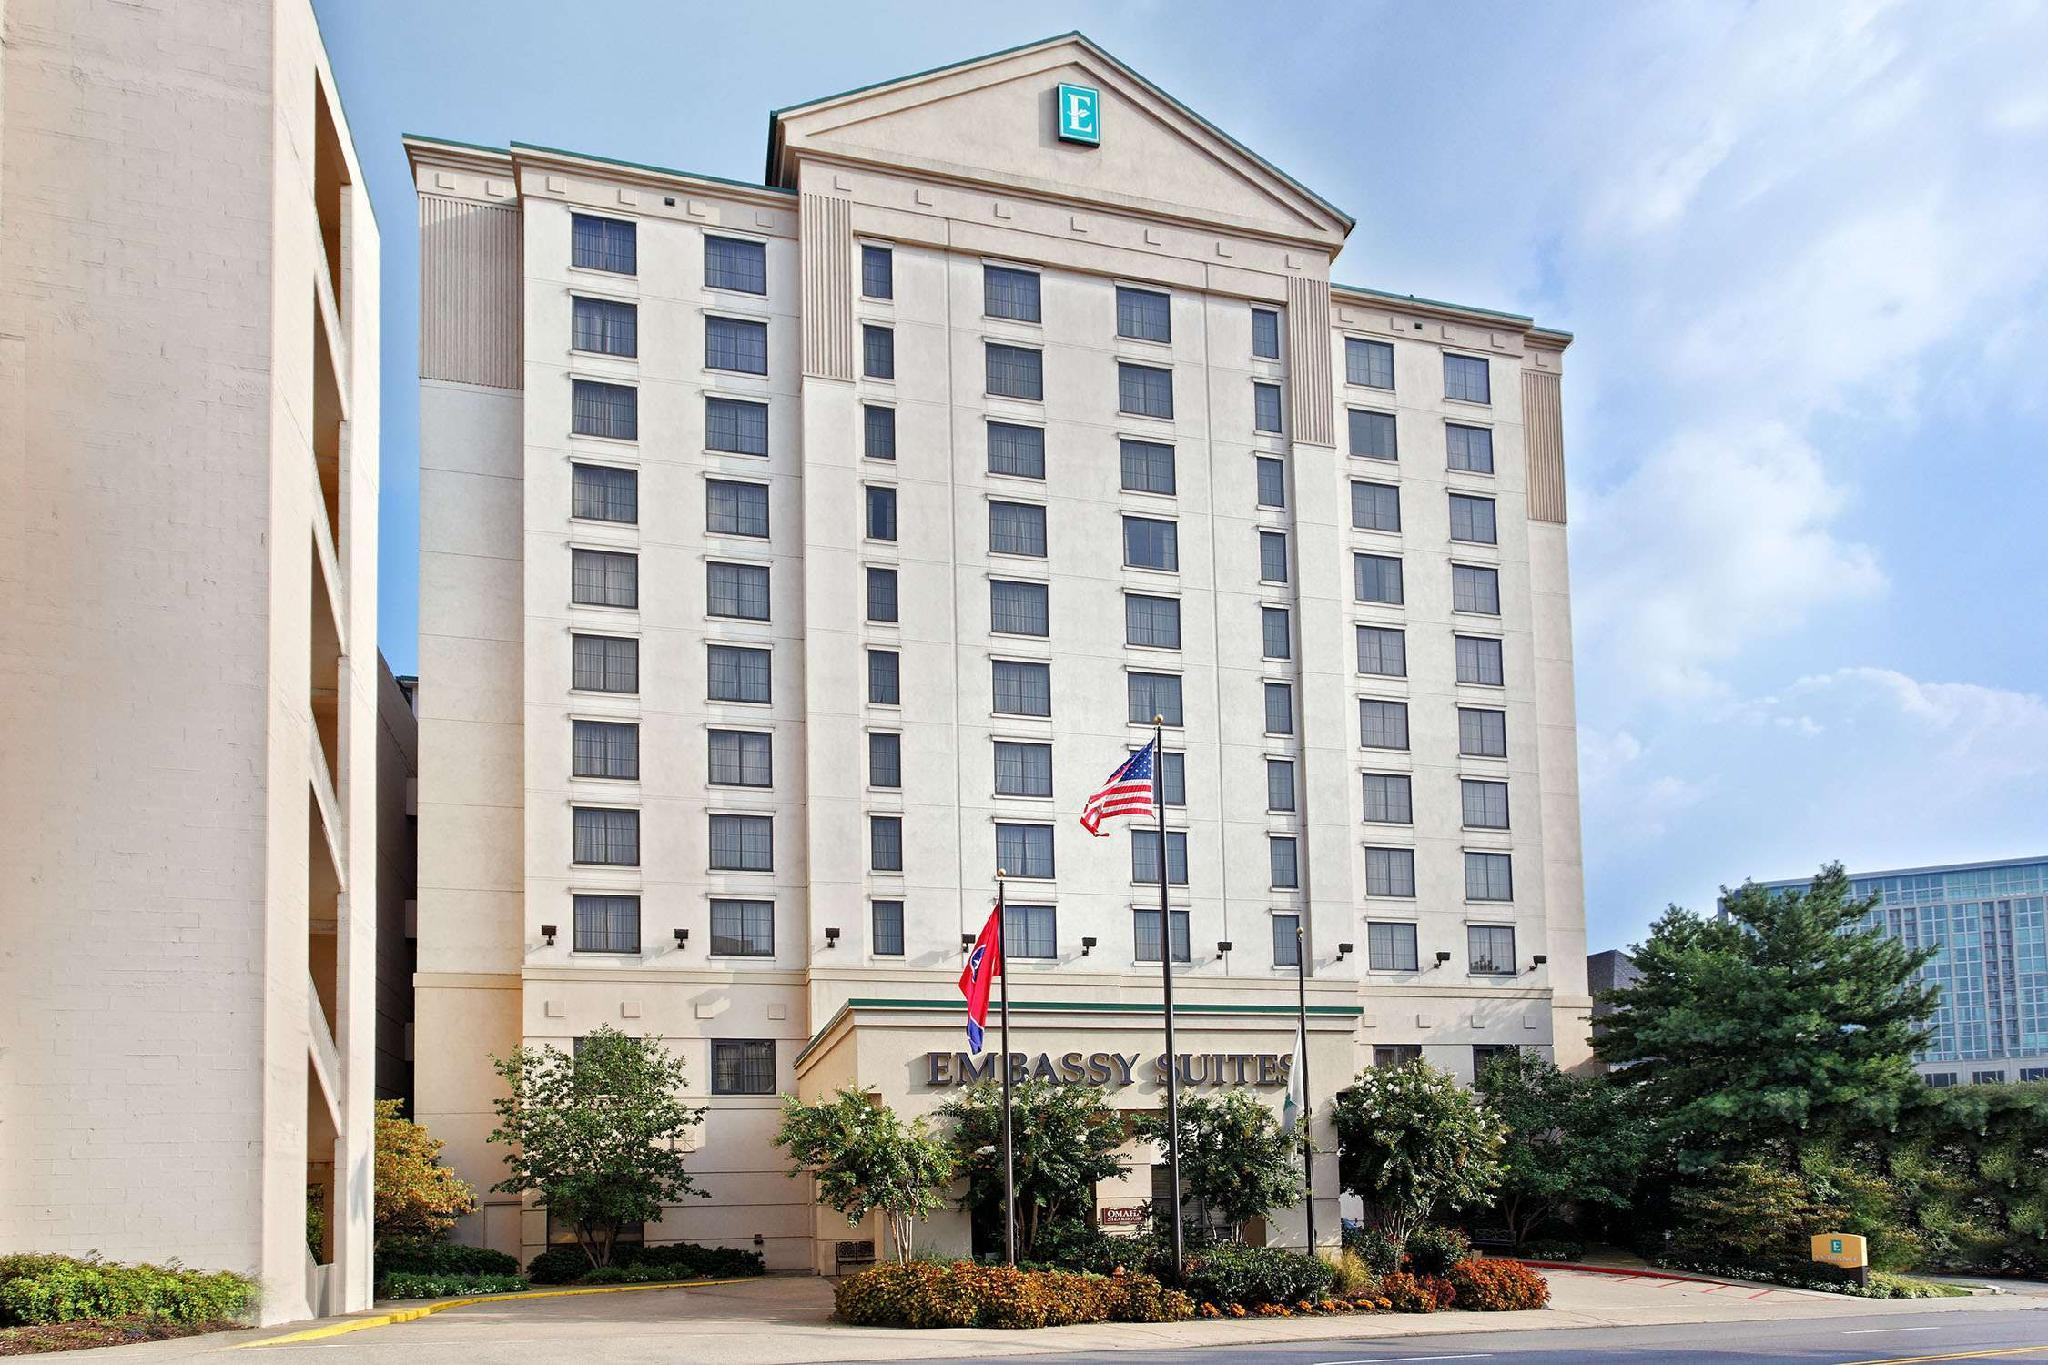 Embassy Suites Hotel Nashville At Vanderbilt